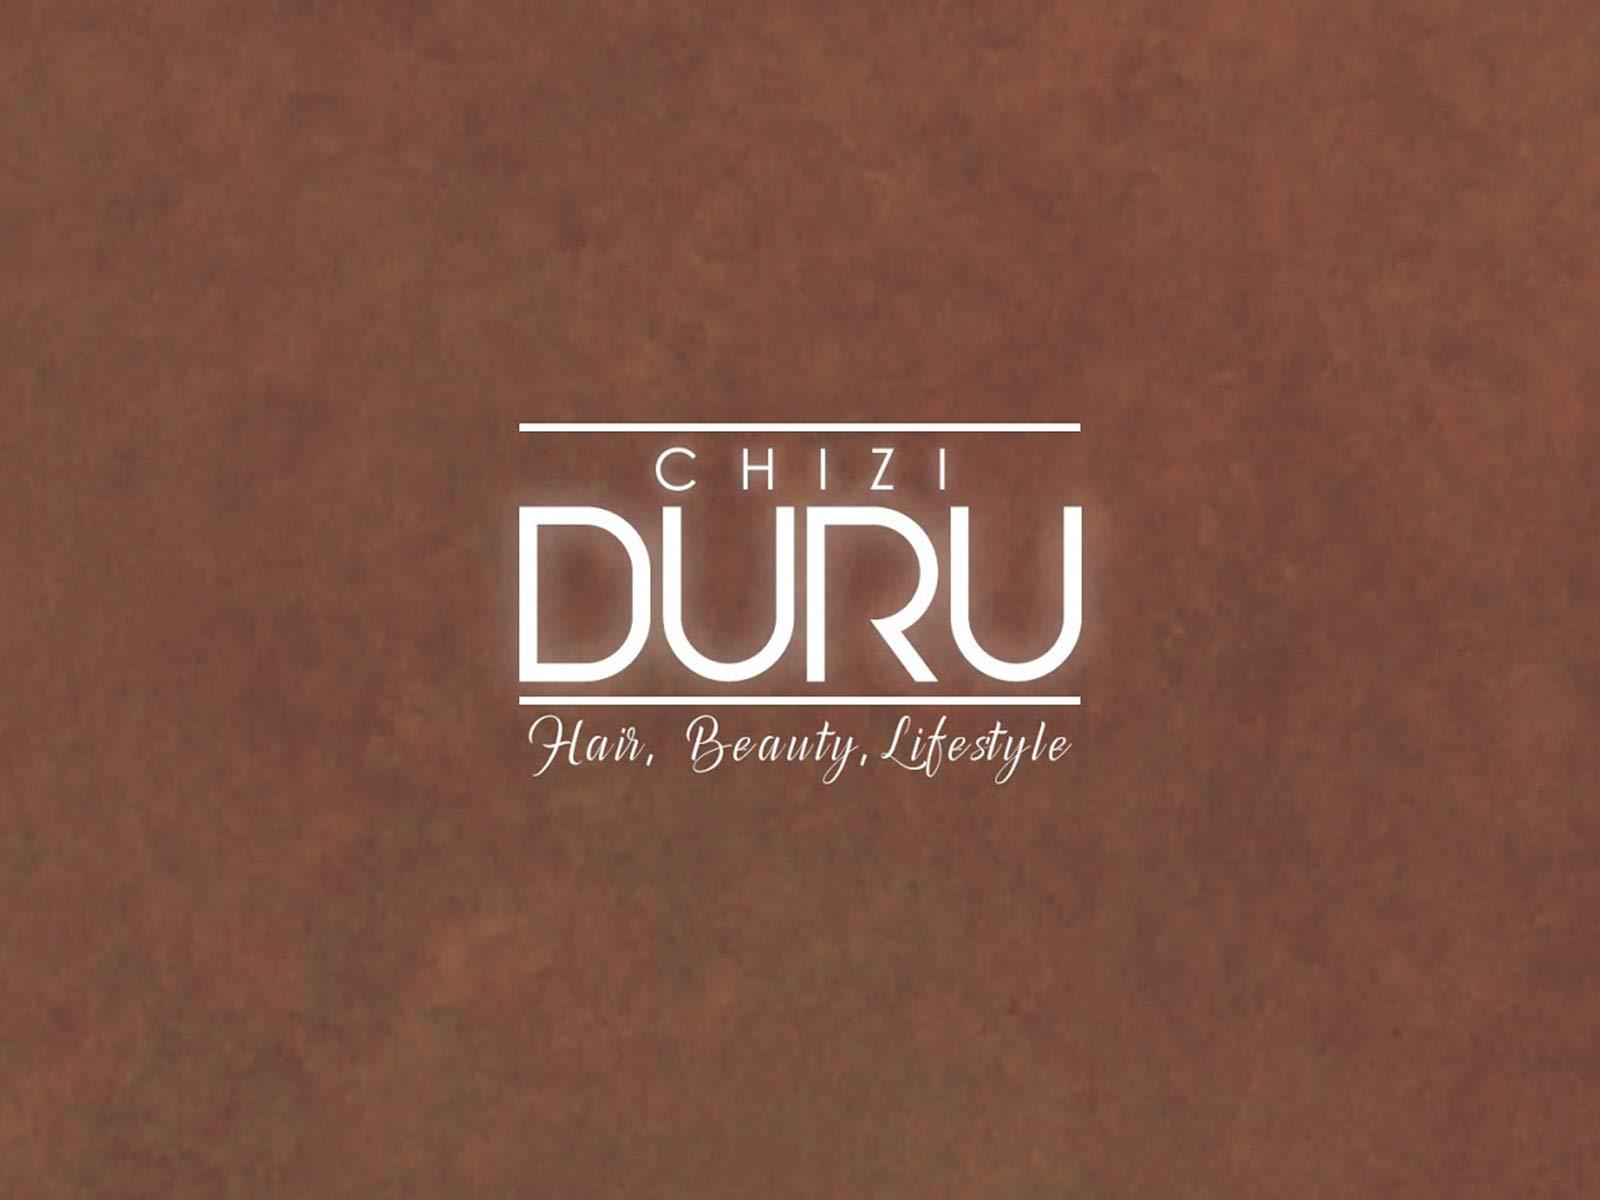 Chizi Duru - Season 1